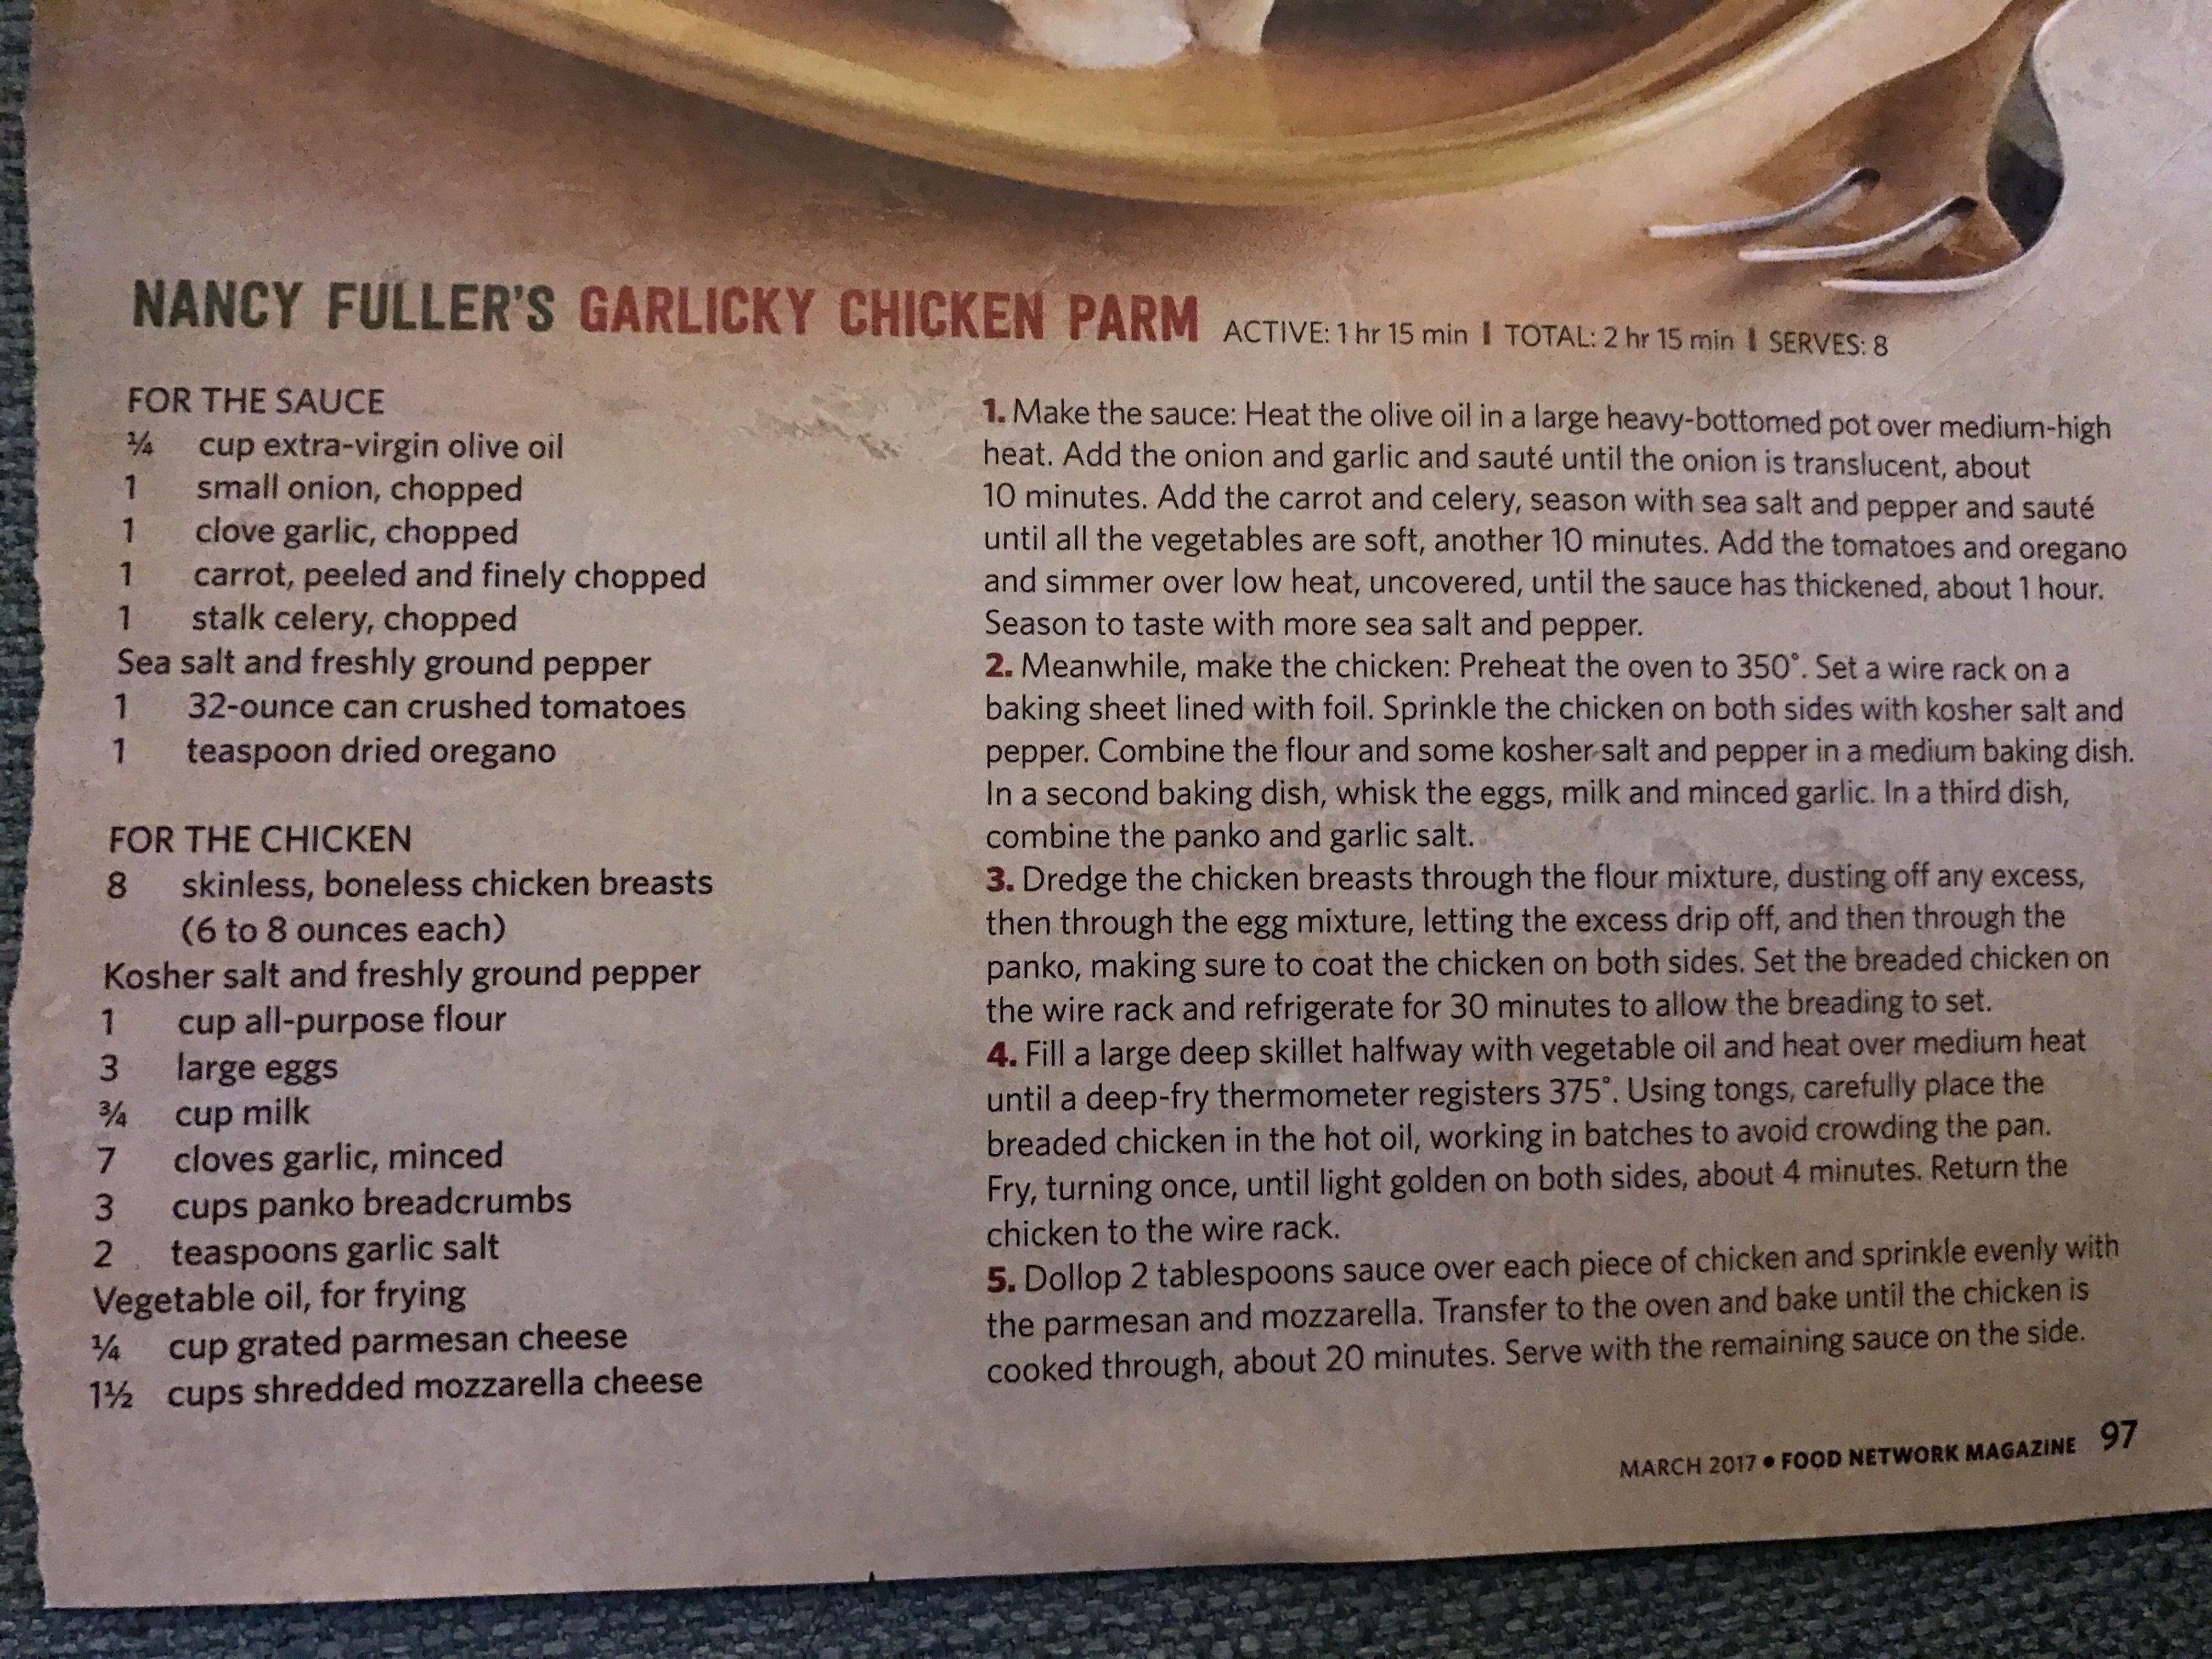 Nancy Fuller's Garlicky Chicken Parm Farmhouse rules